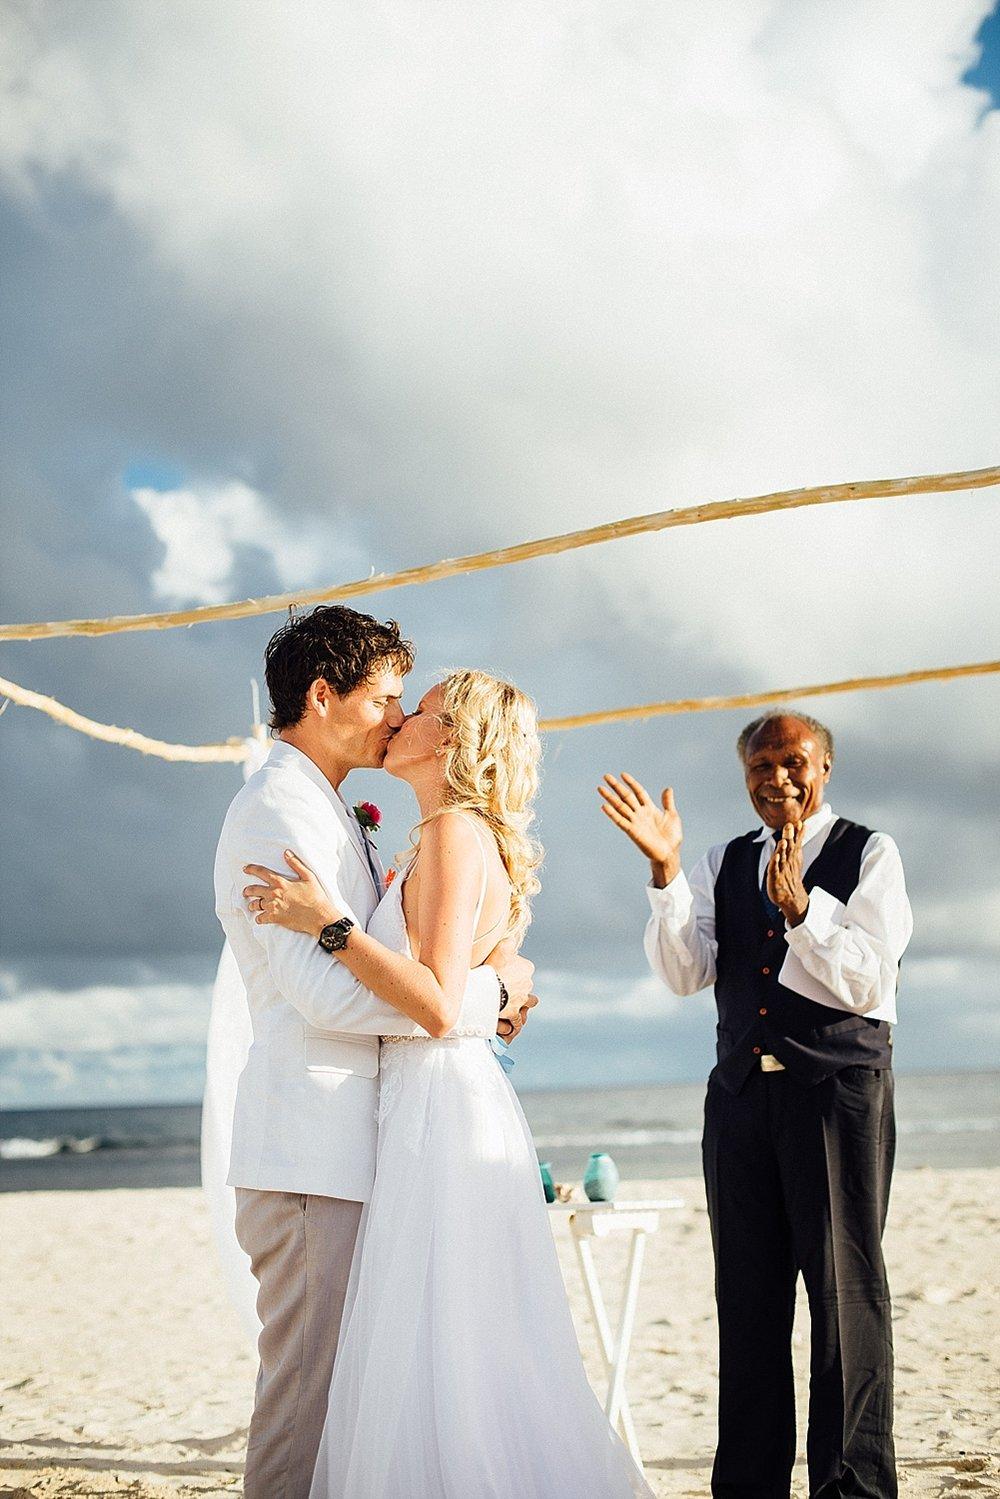 AnnaKyle-WeddingPhotography-TamanuOnTheBeach-VillaChampagne-GroovyBanana-VanuatuPhotographers_0015.jpg